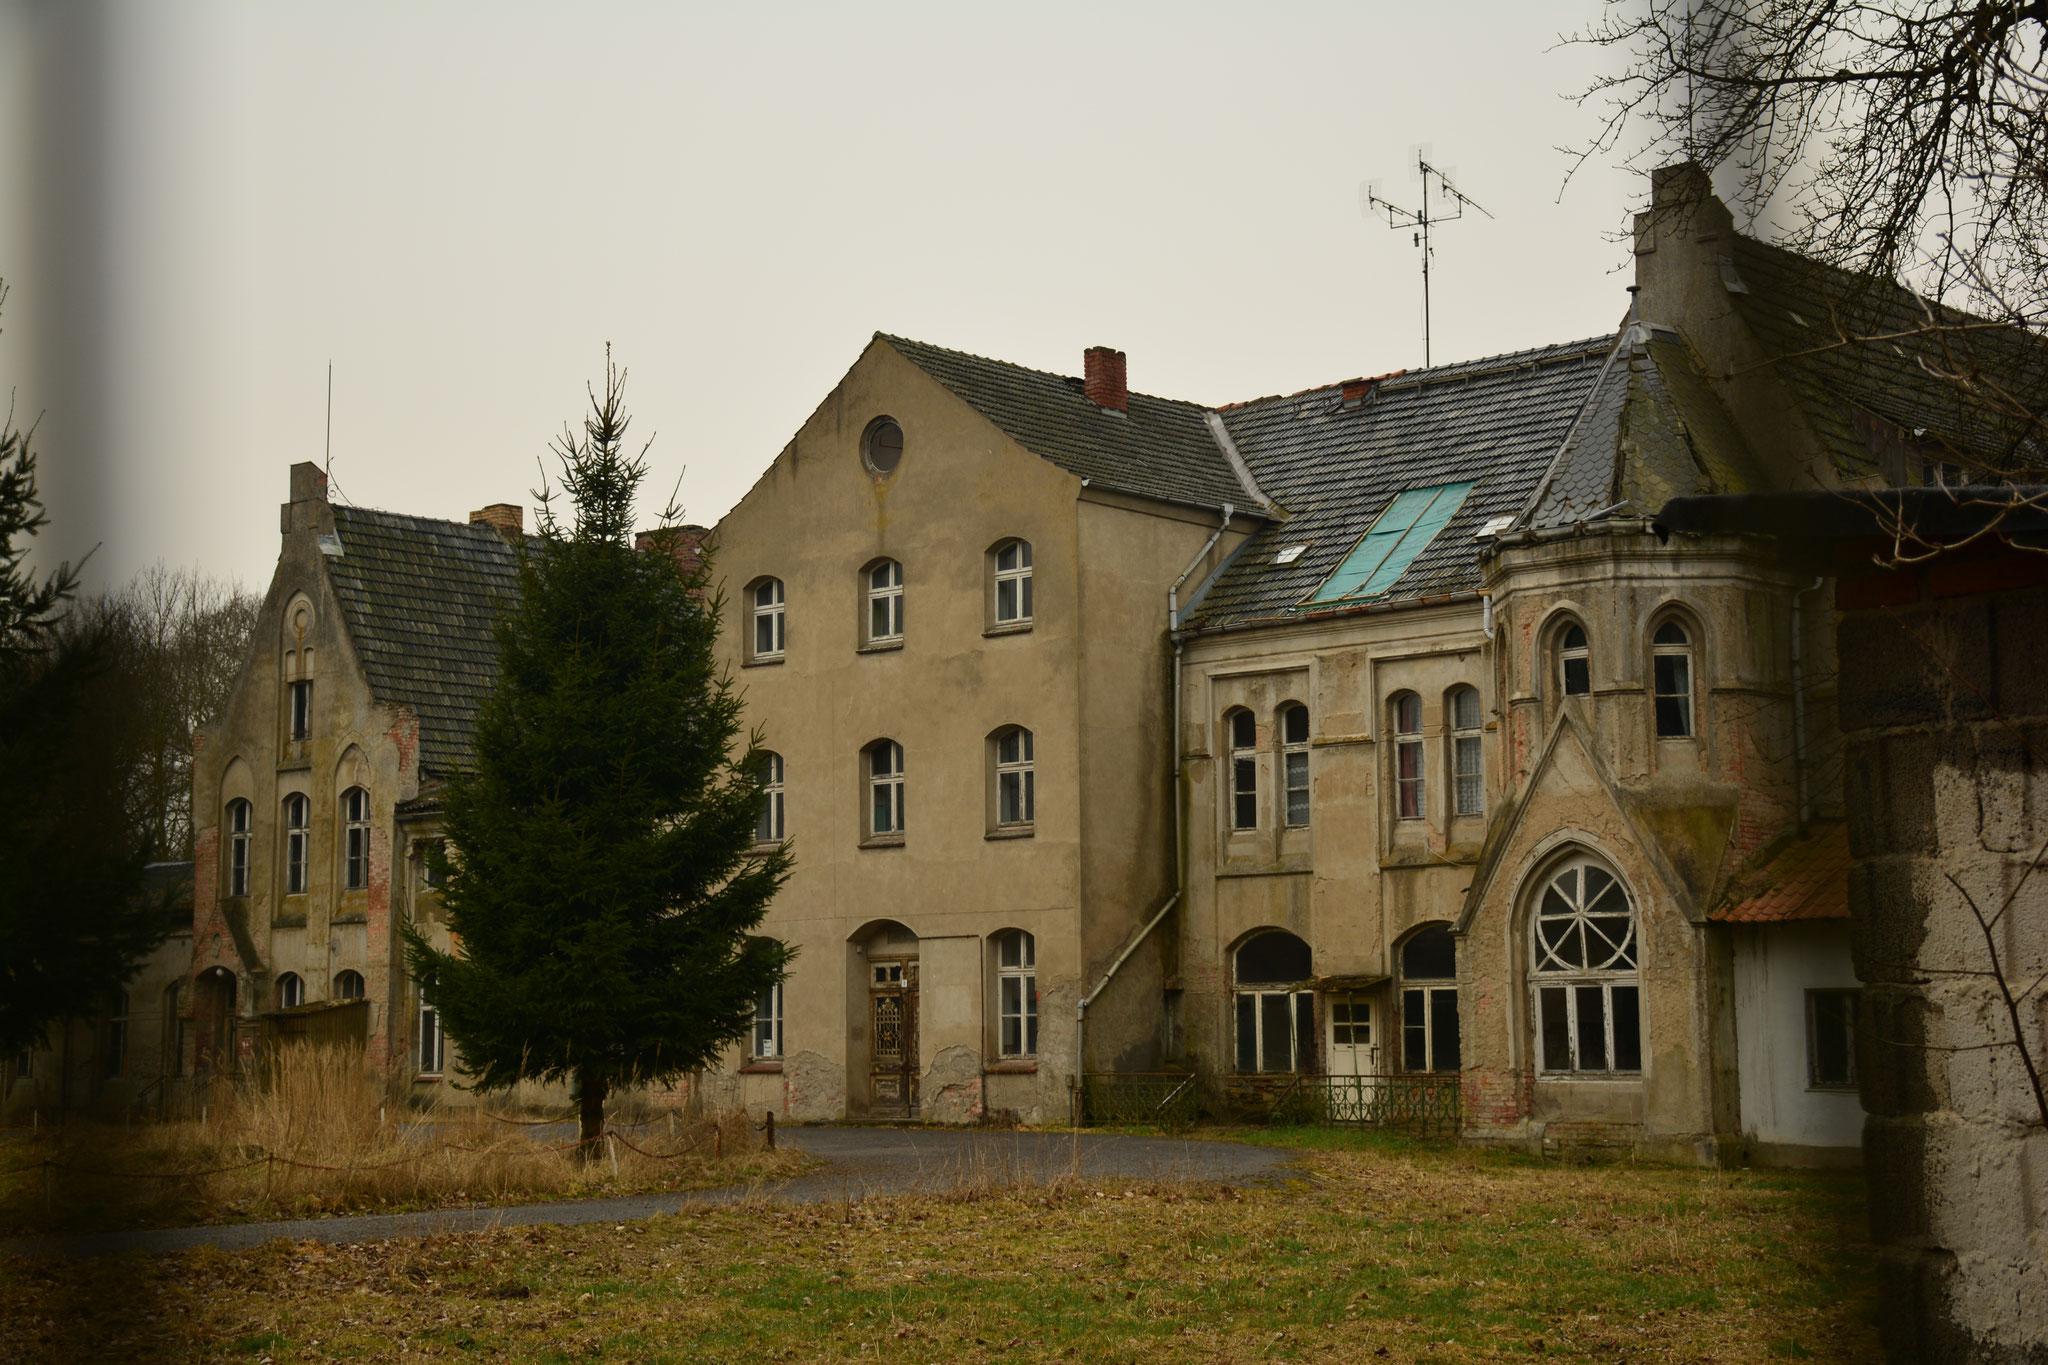 Pöglitz